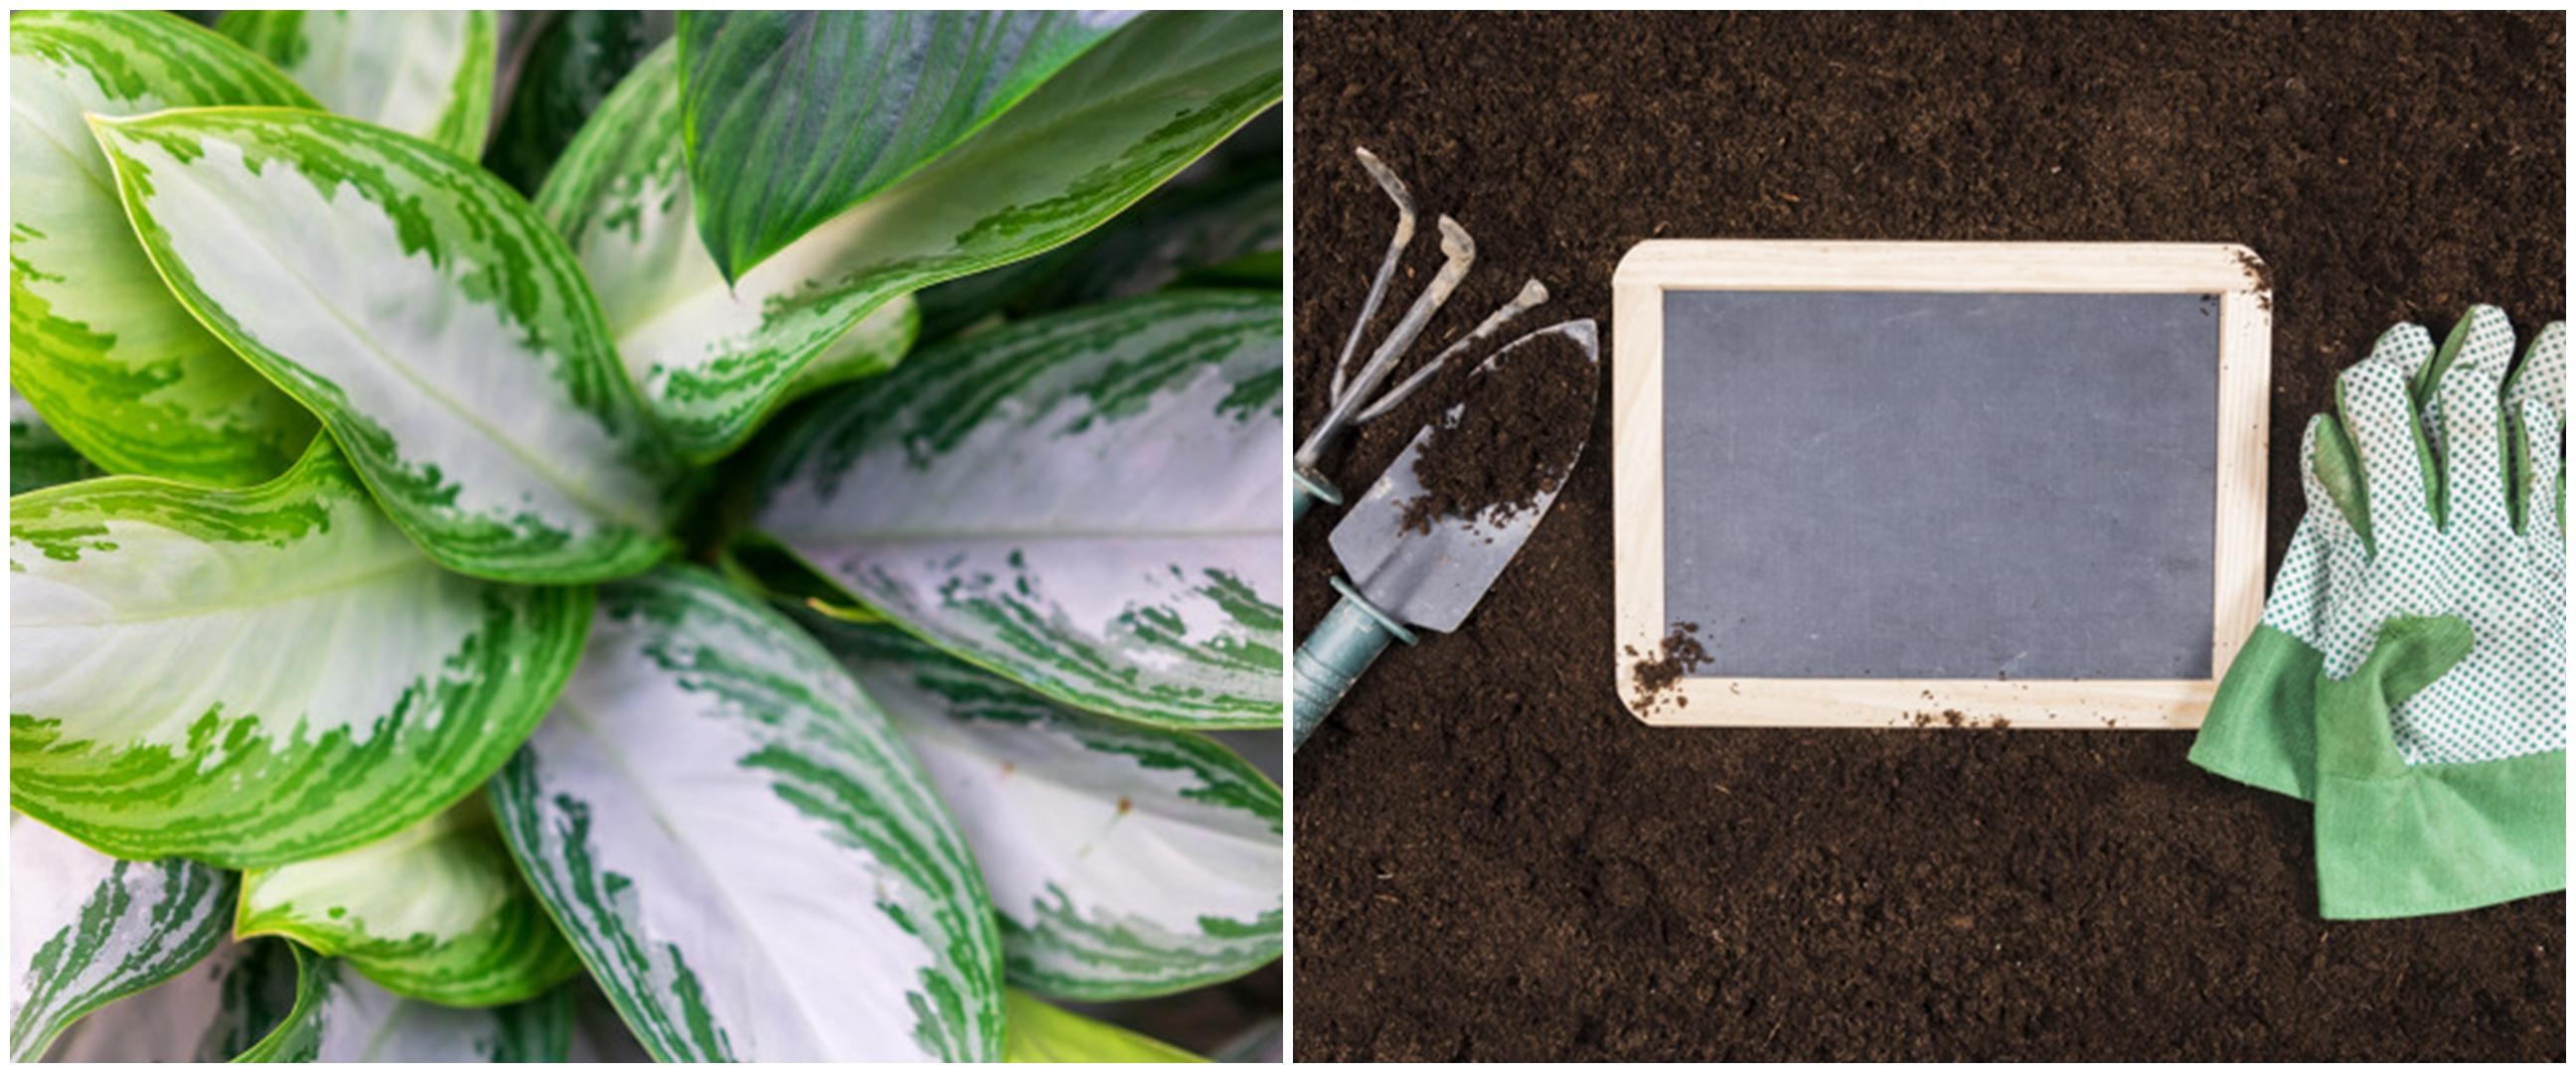 8 Cara merawat aglonema silver queen, bikin tanaman sehat